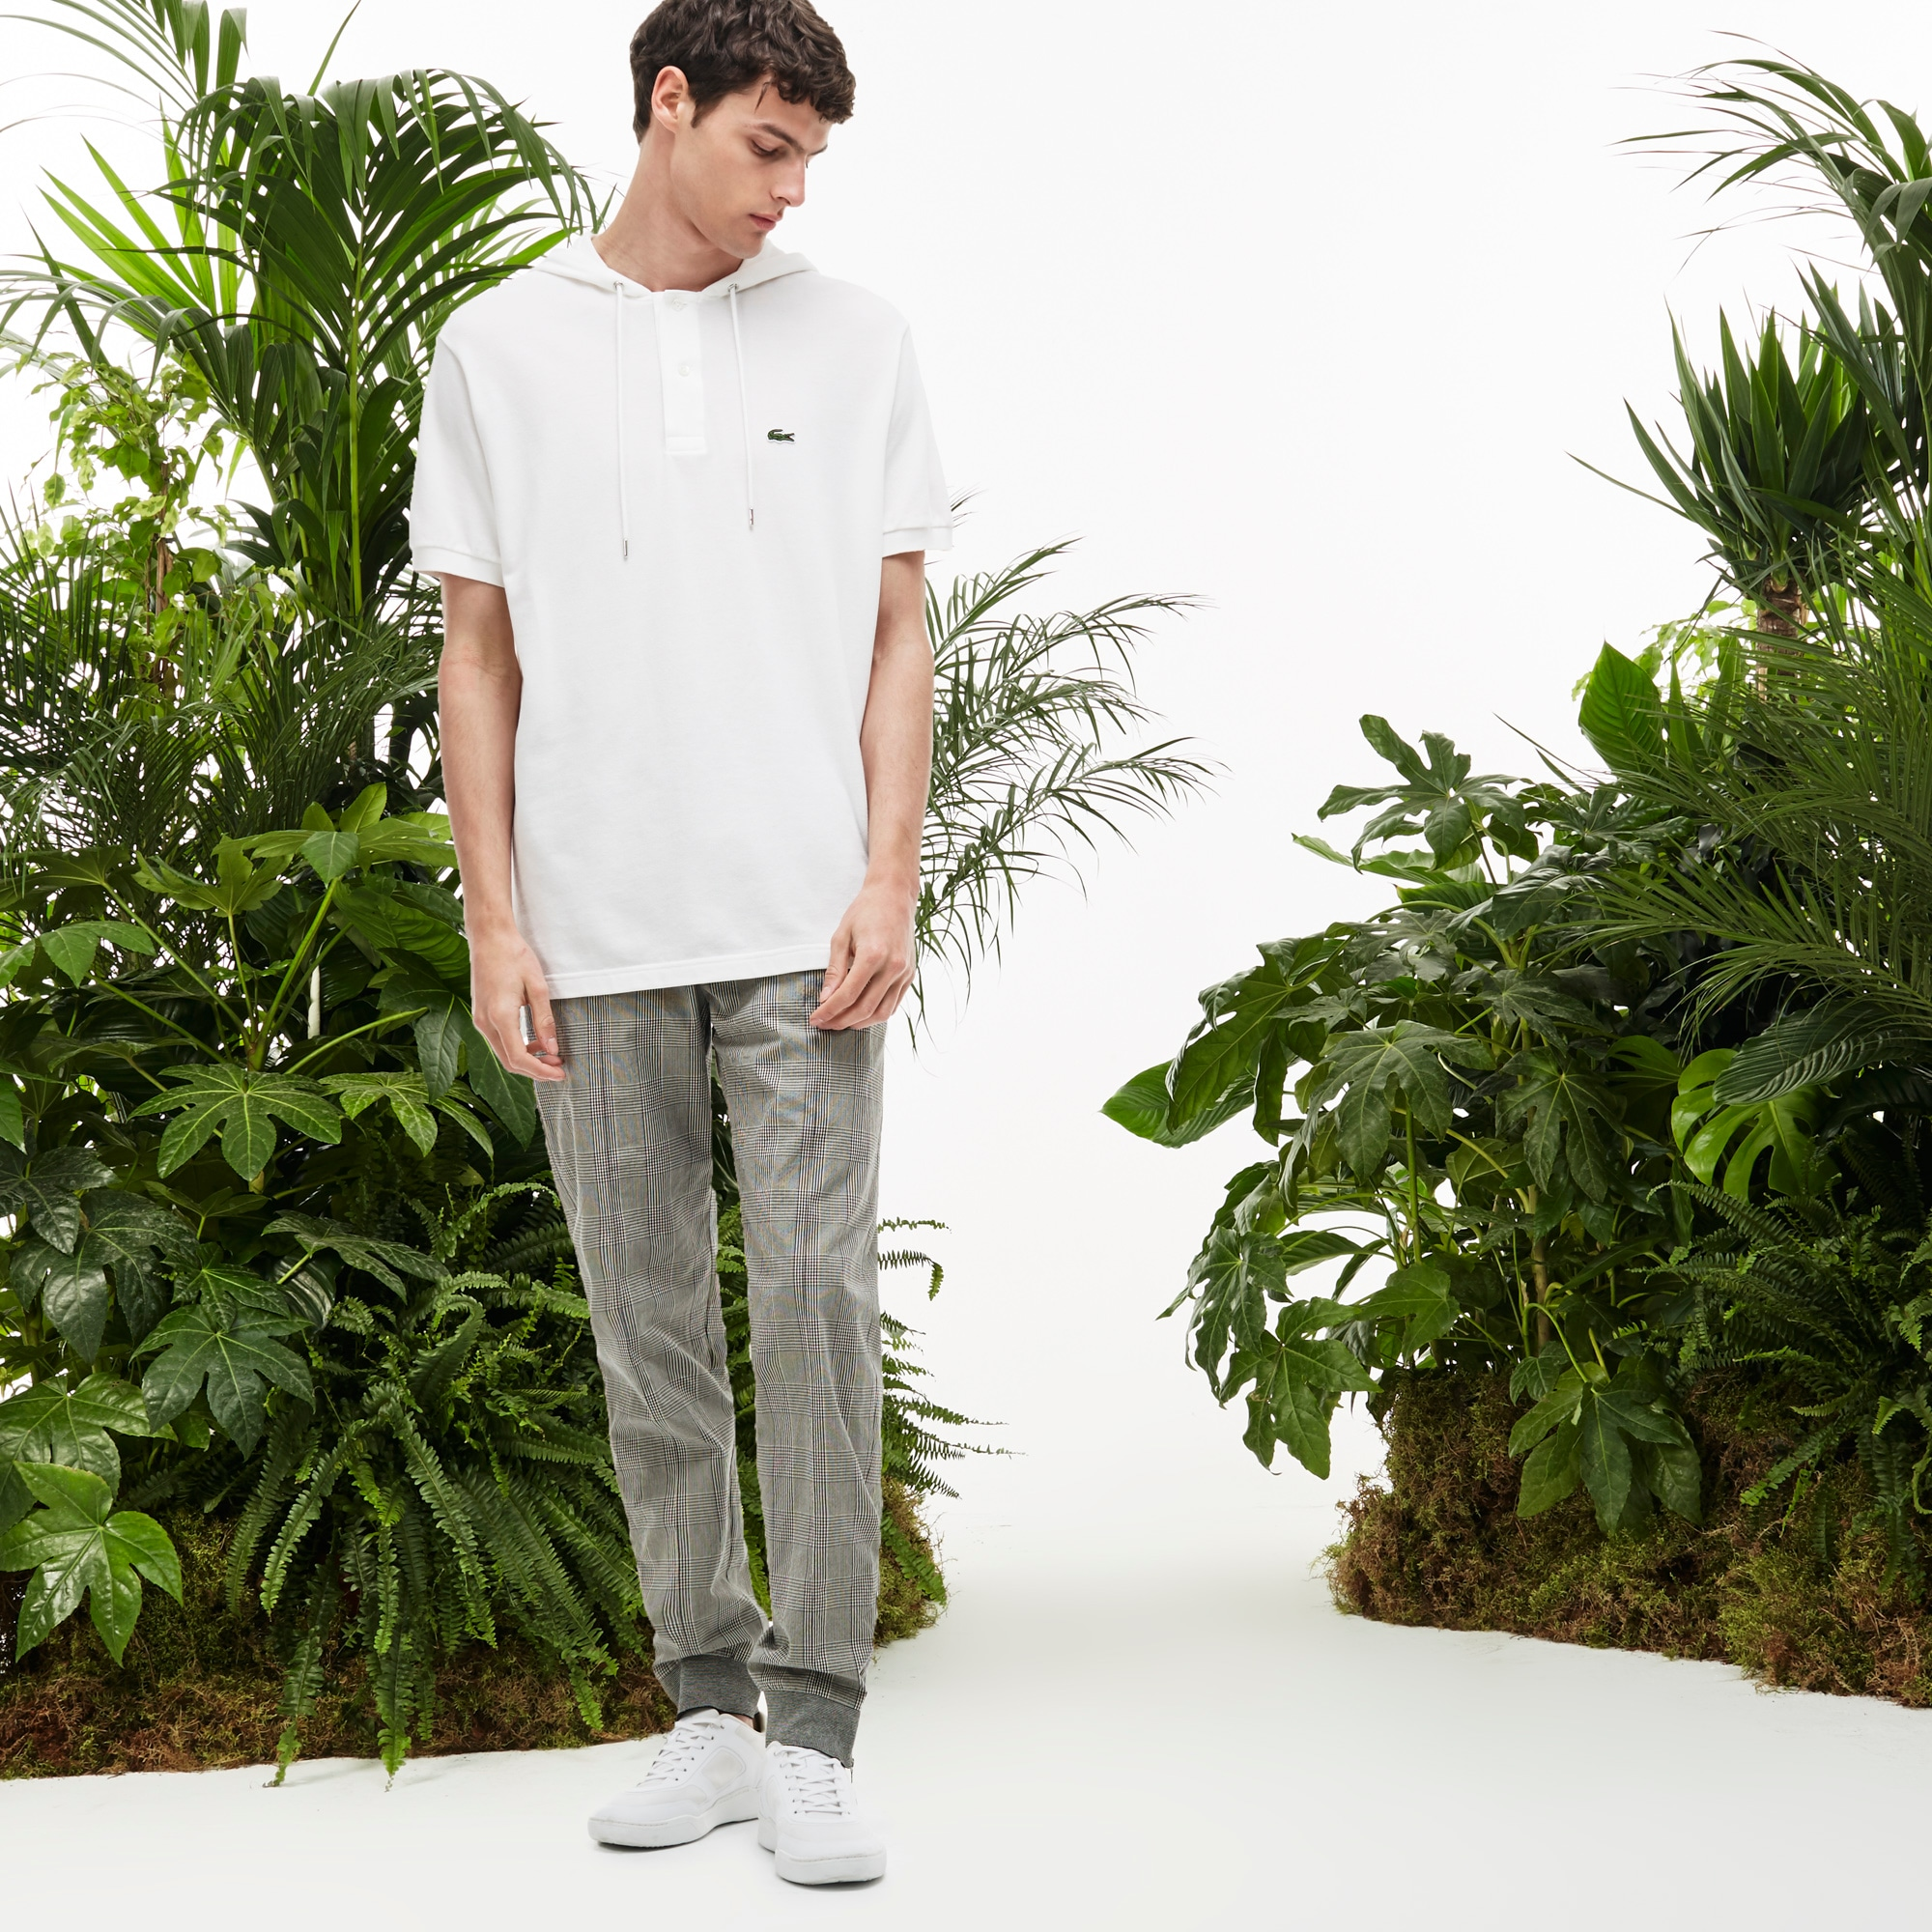 Men's Fashion Show Urban Seersucker Trackpants